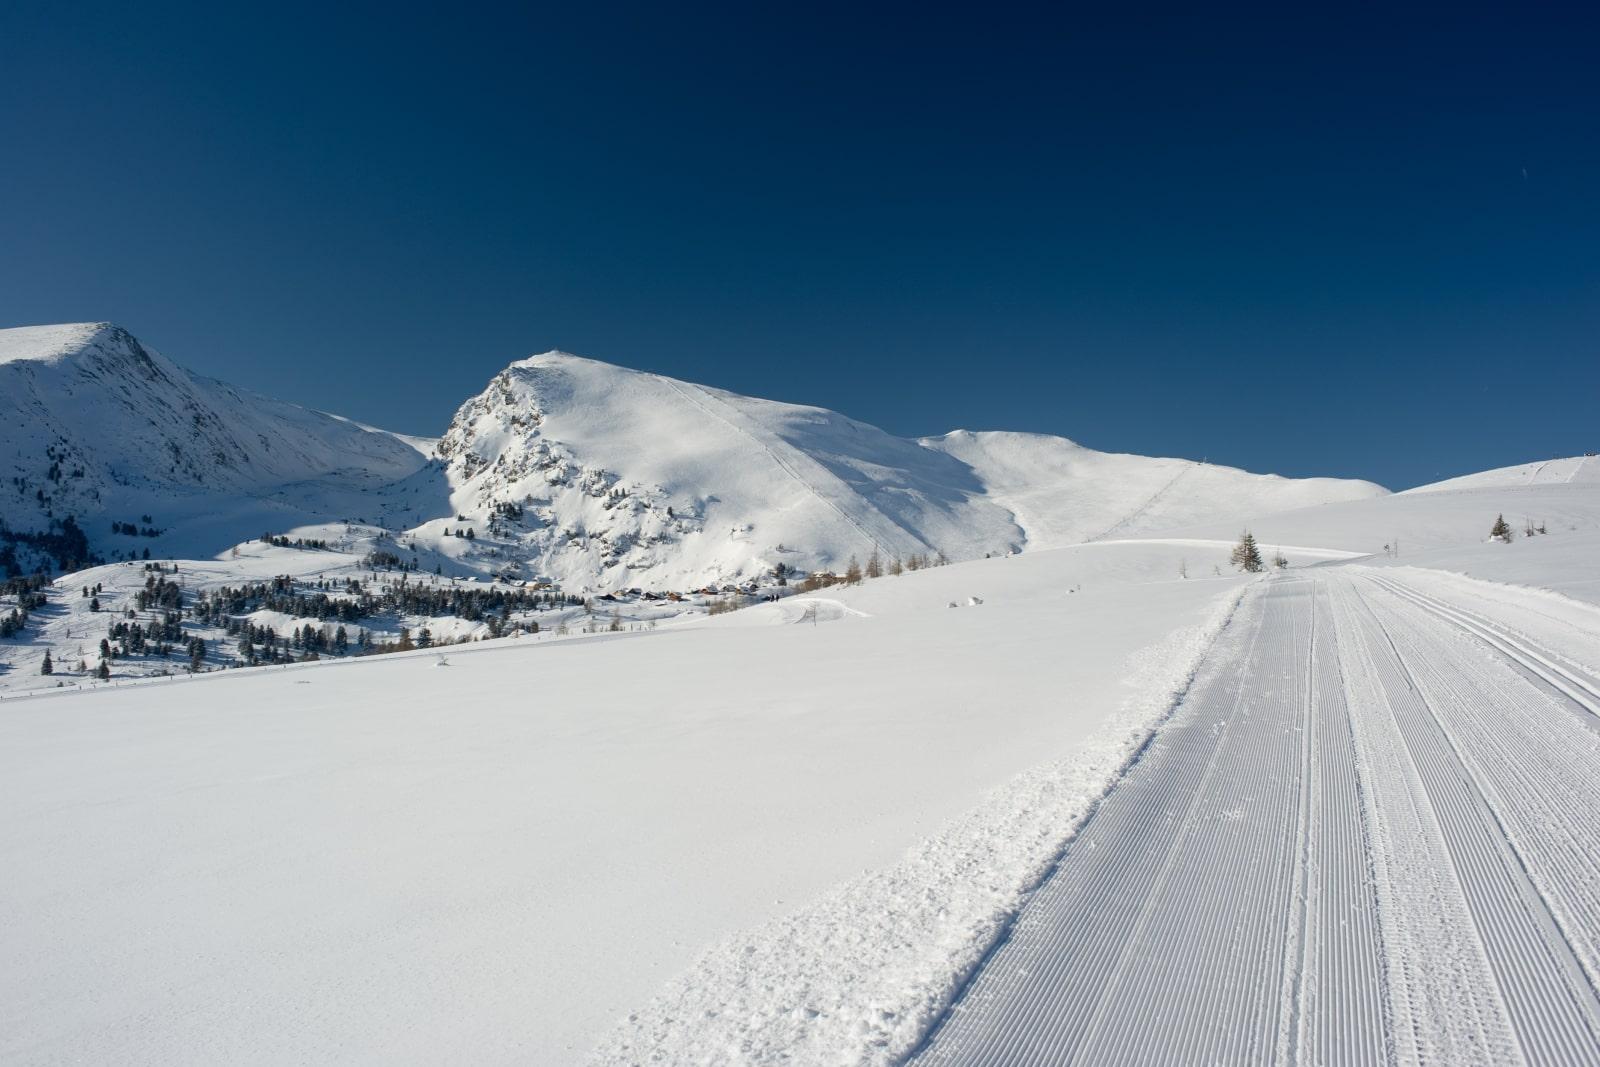 Heidi-Chalet-Falkert-Heidialm-Falkertsee-Hohenloipe-Ski-Winterwandern